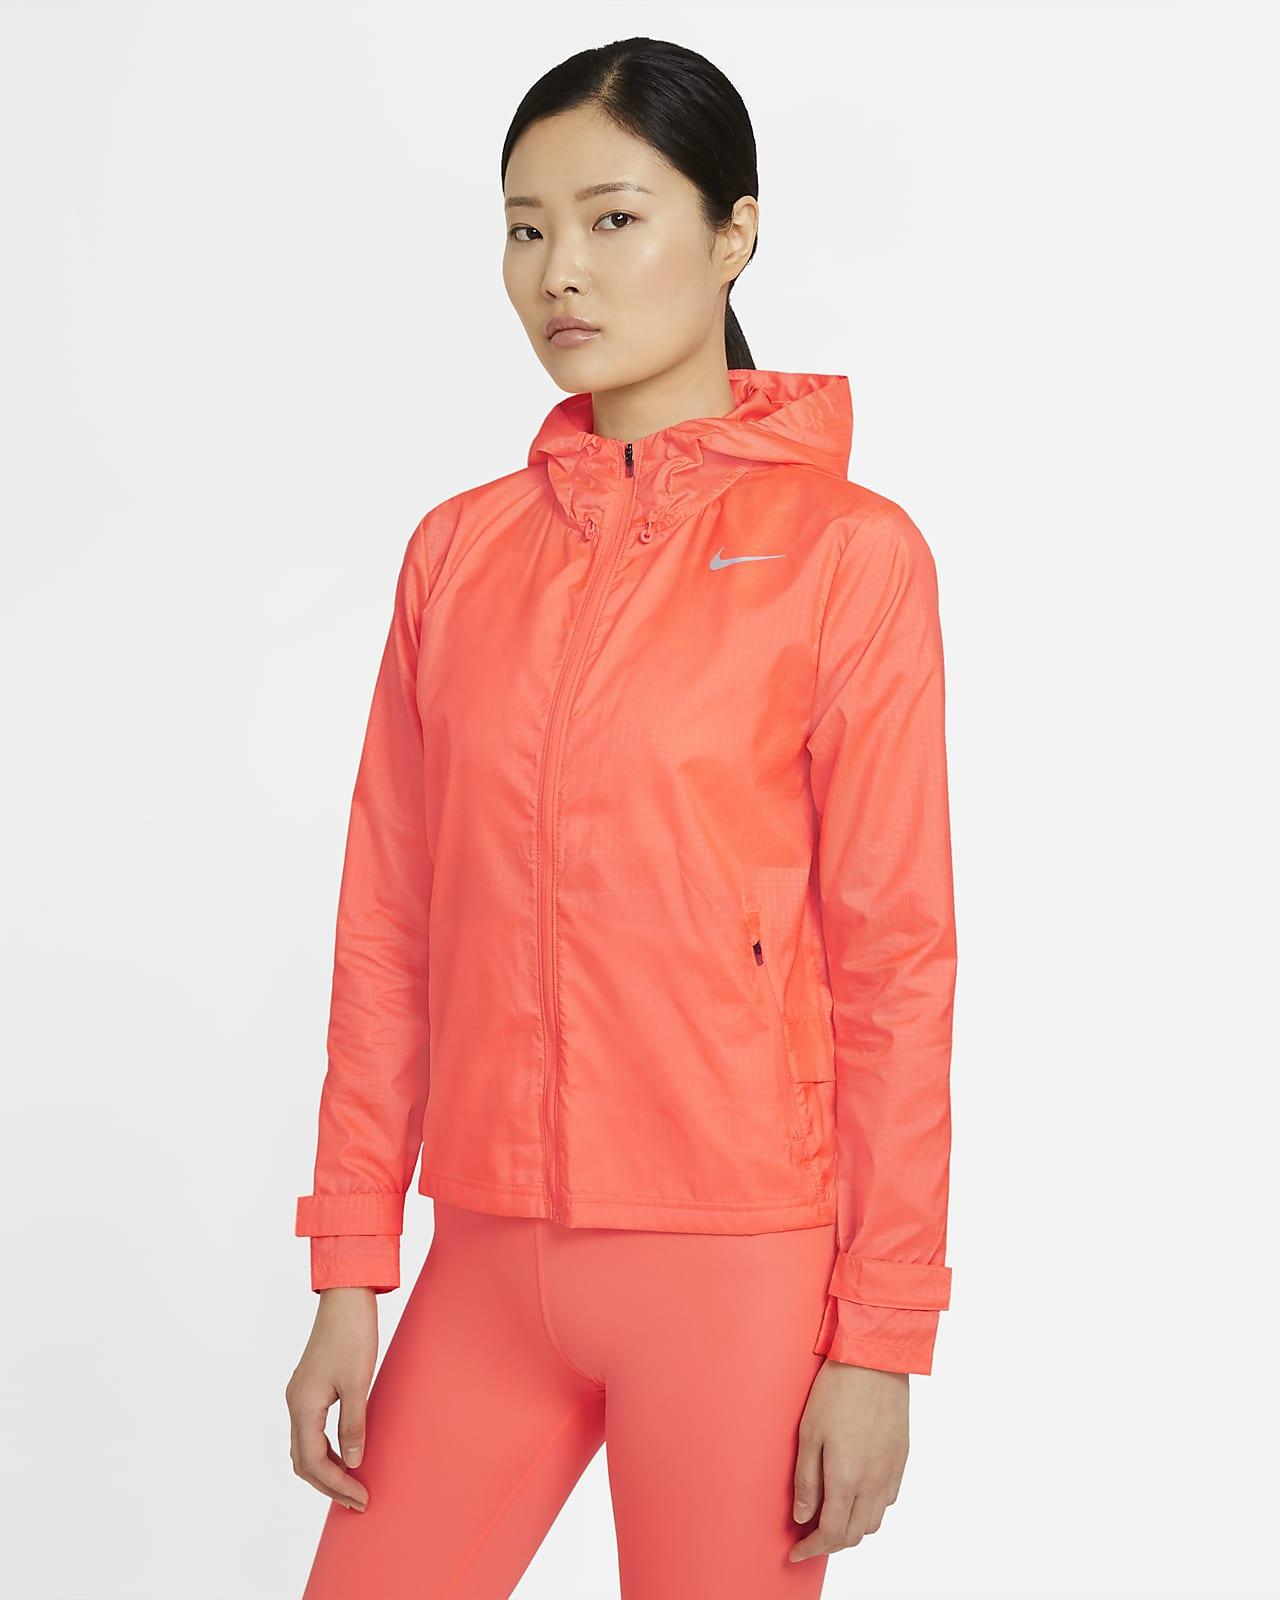 Nike Essential 女子跑步夹克